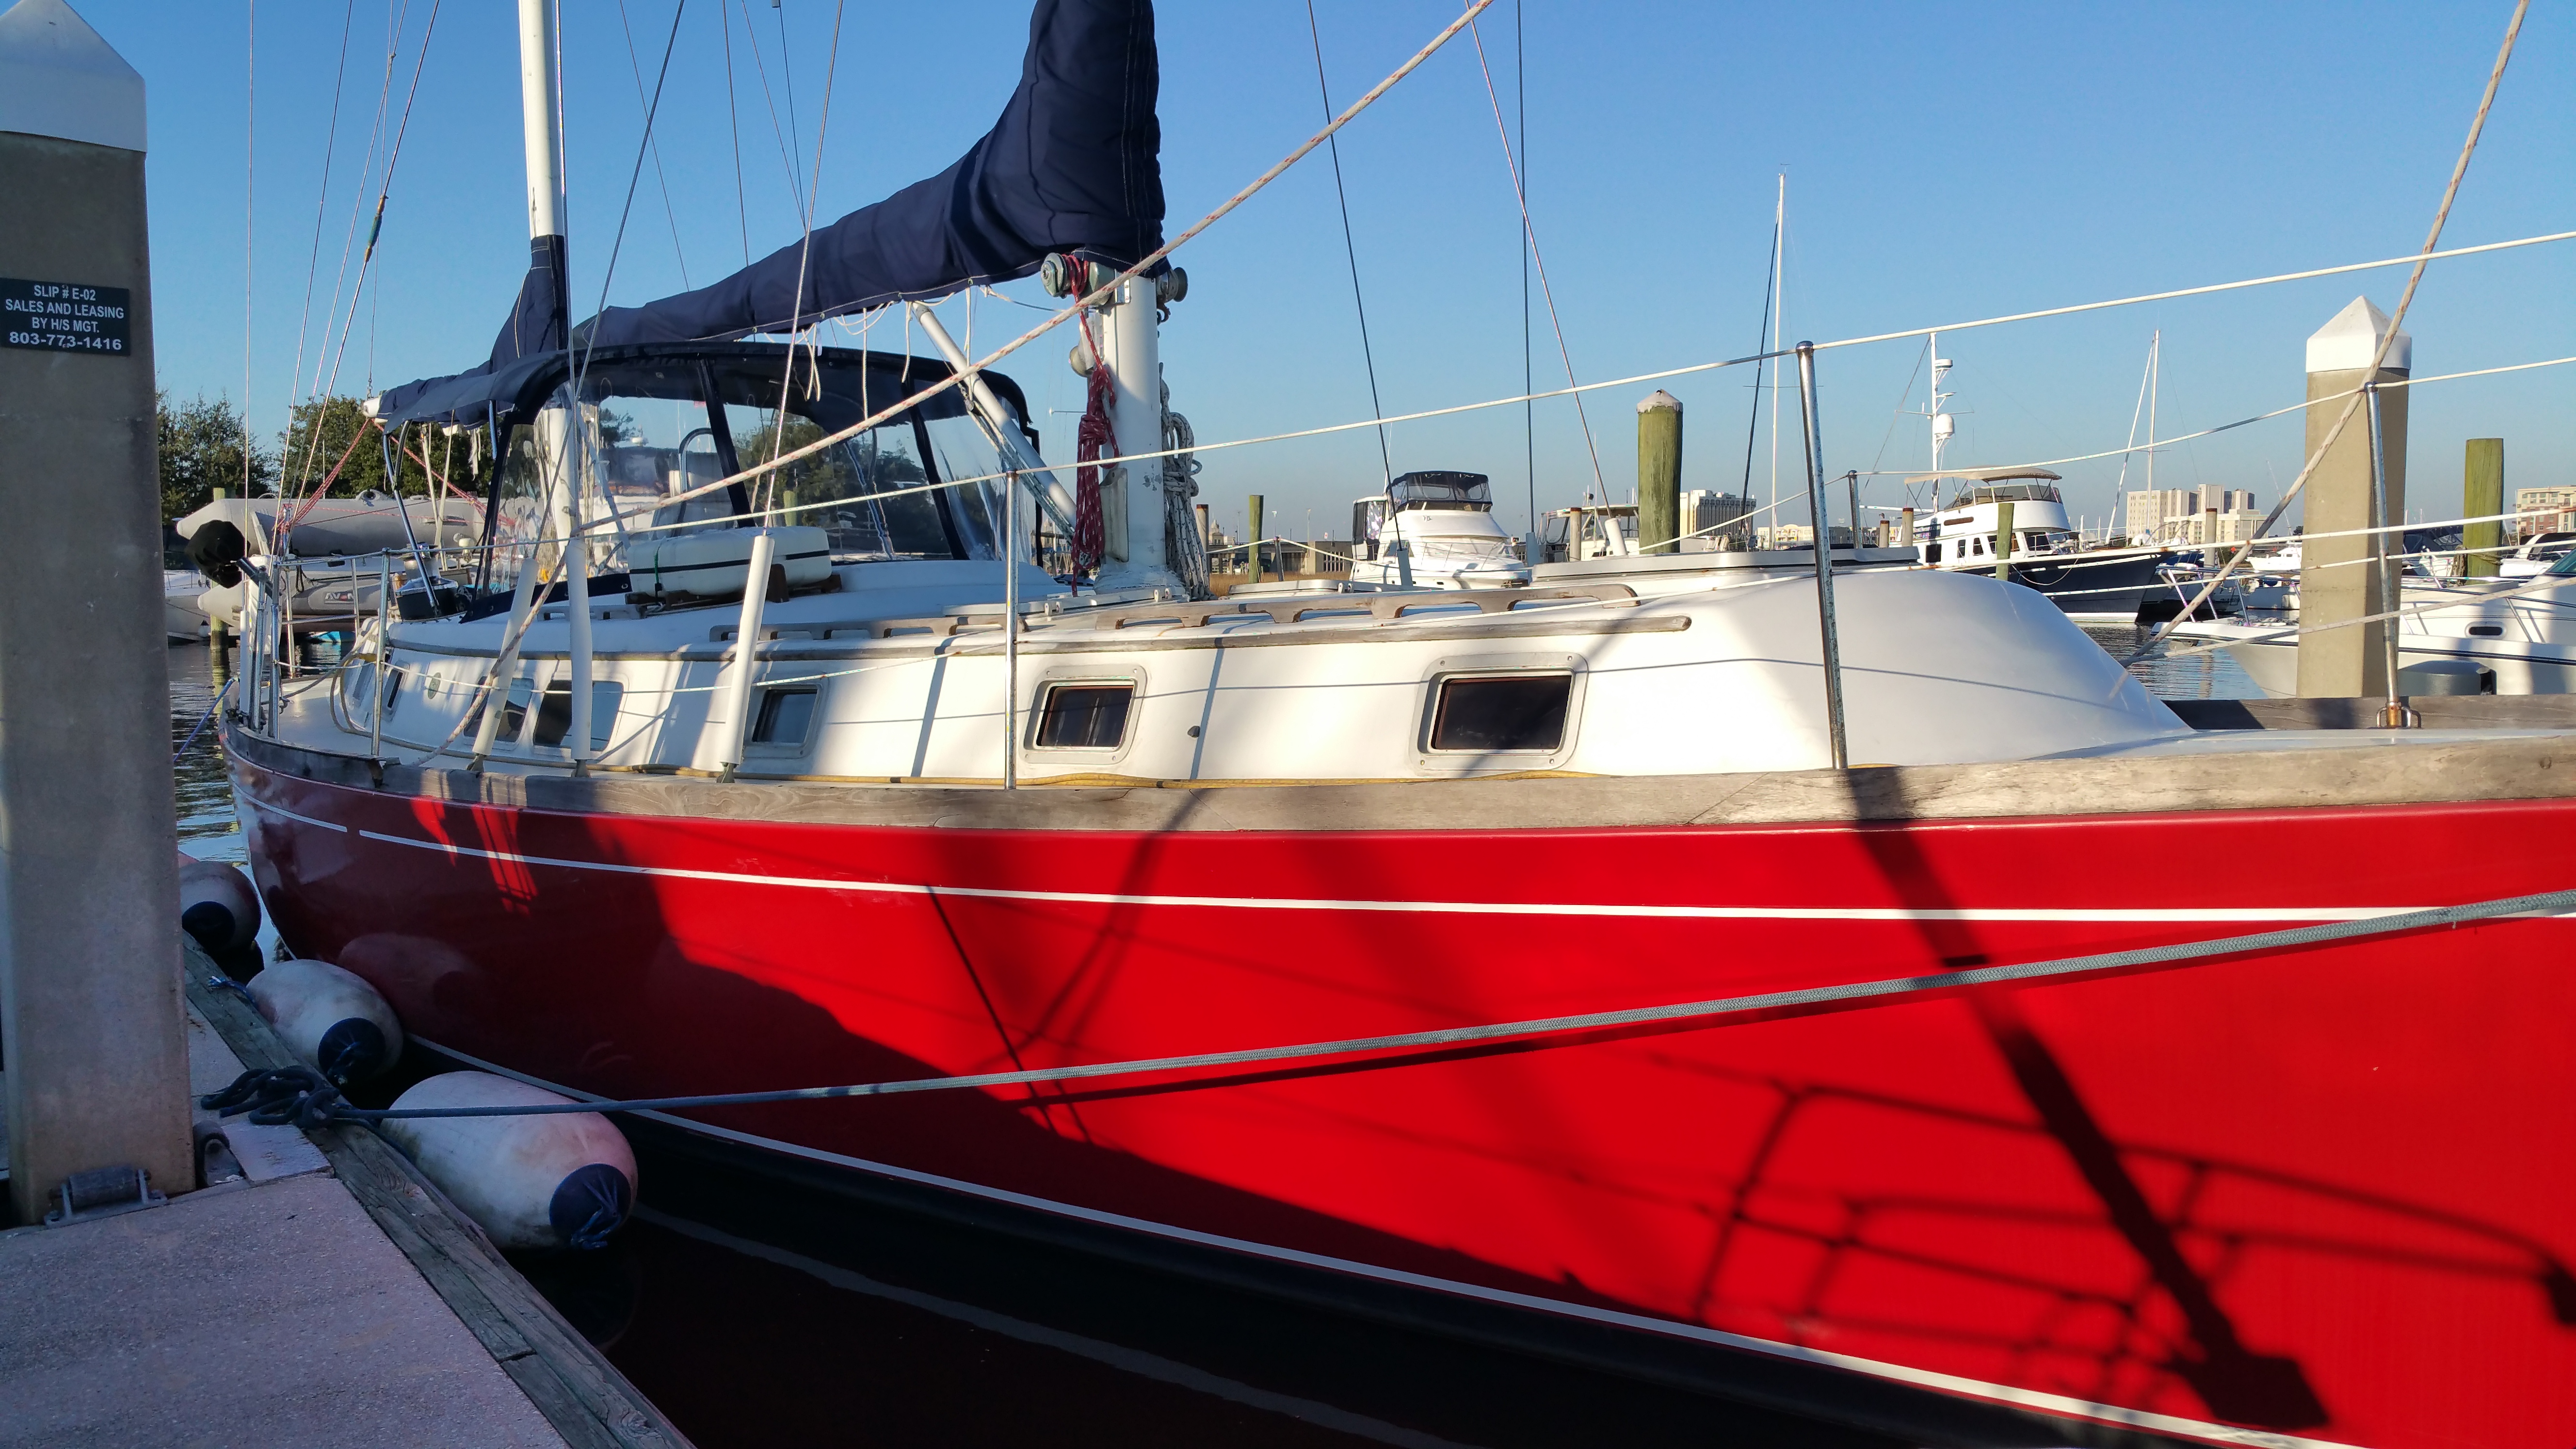 Private Charter - Gulfstar 50 Sailboat